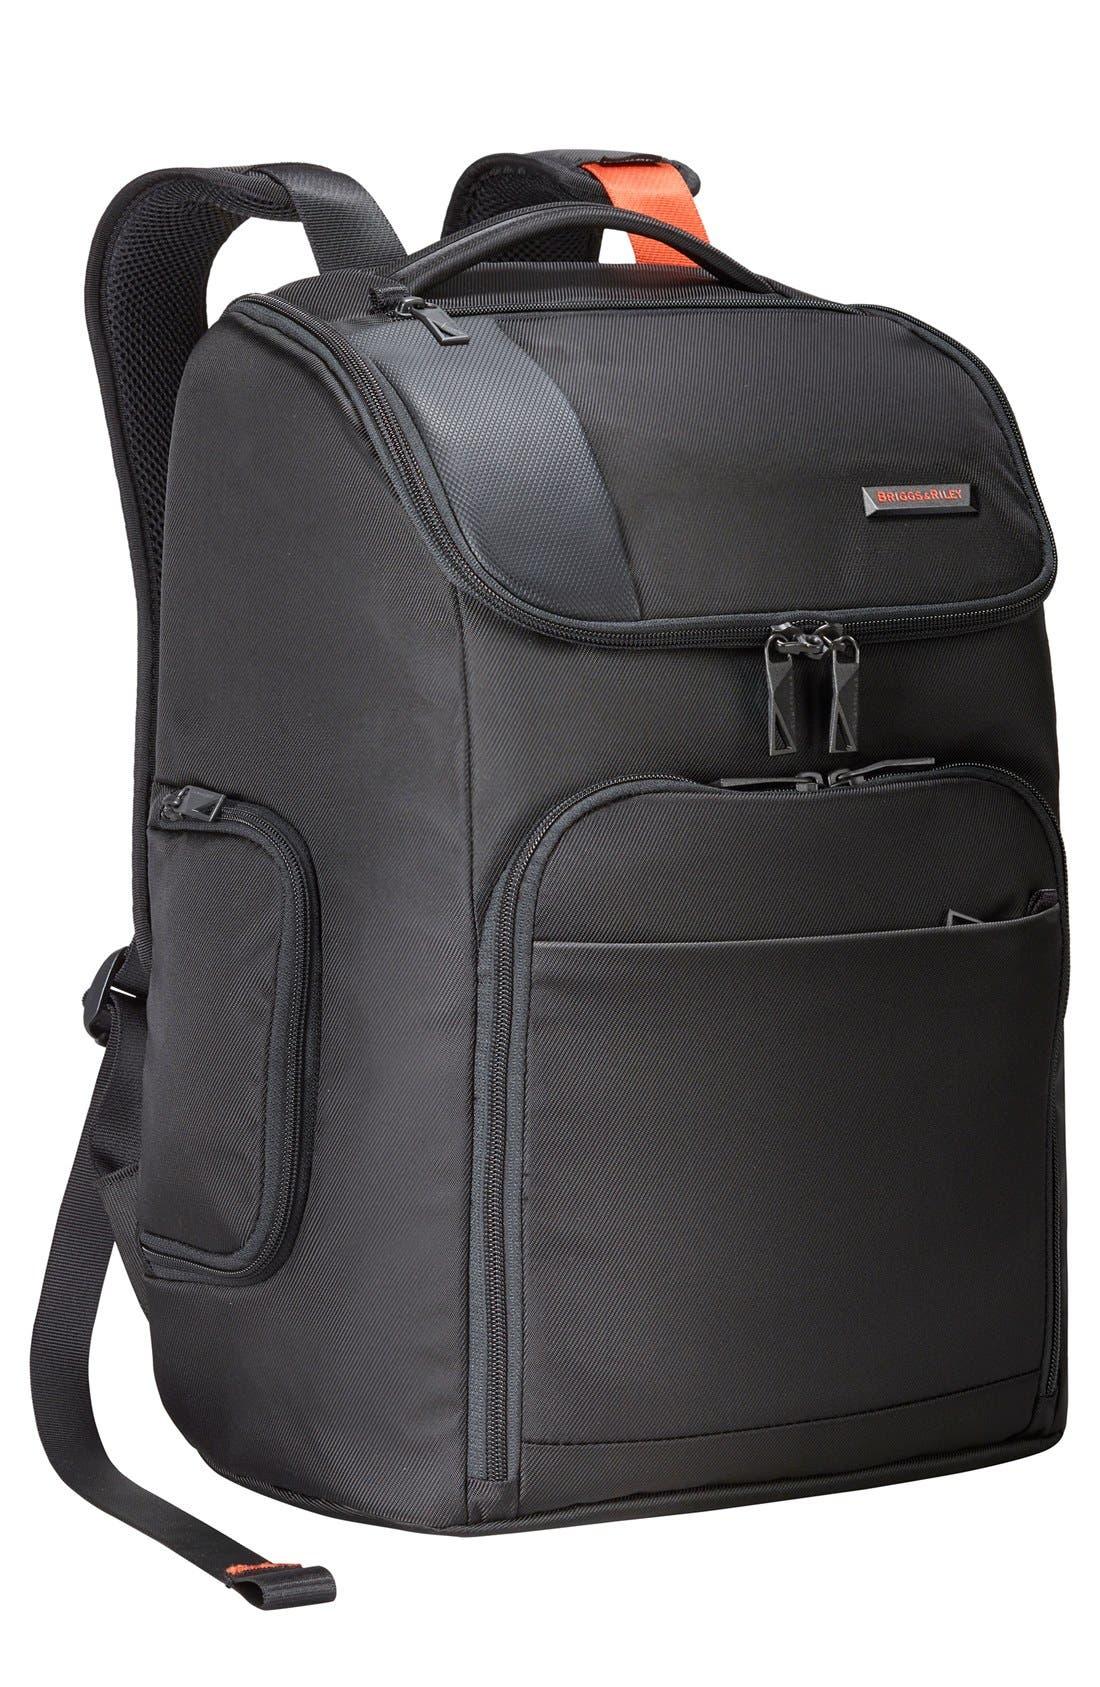 BRIGGS & RILEY Verb - Advance Water & Wear Resistant Ballistic Nylon Backpack, Main, color, BLACK